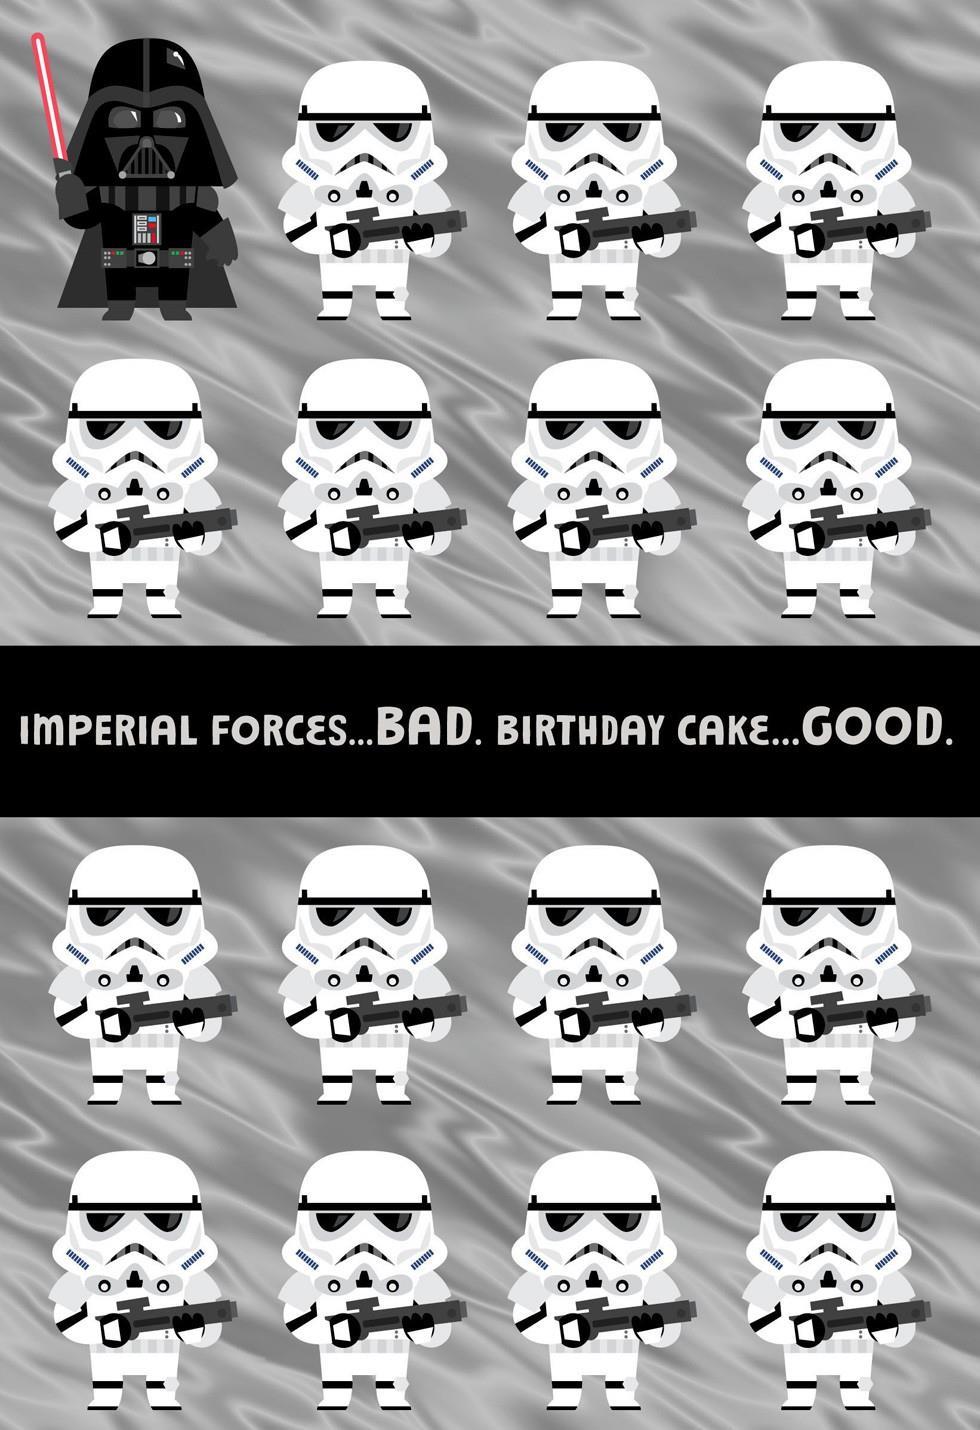 Star wars stormtrooper good and bad birthday card for nephew star wars stormtrooper good and bad birthday card for nephew bookmarktalkfo Images